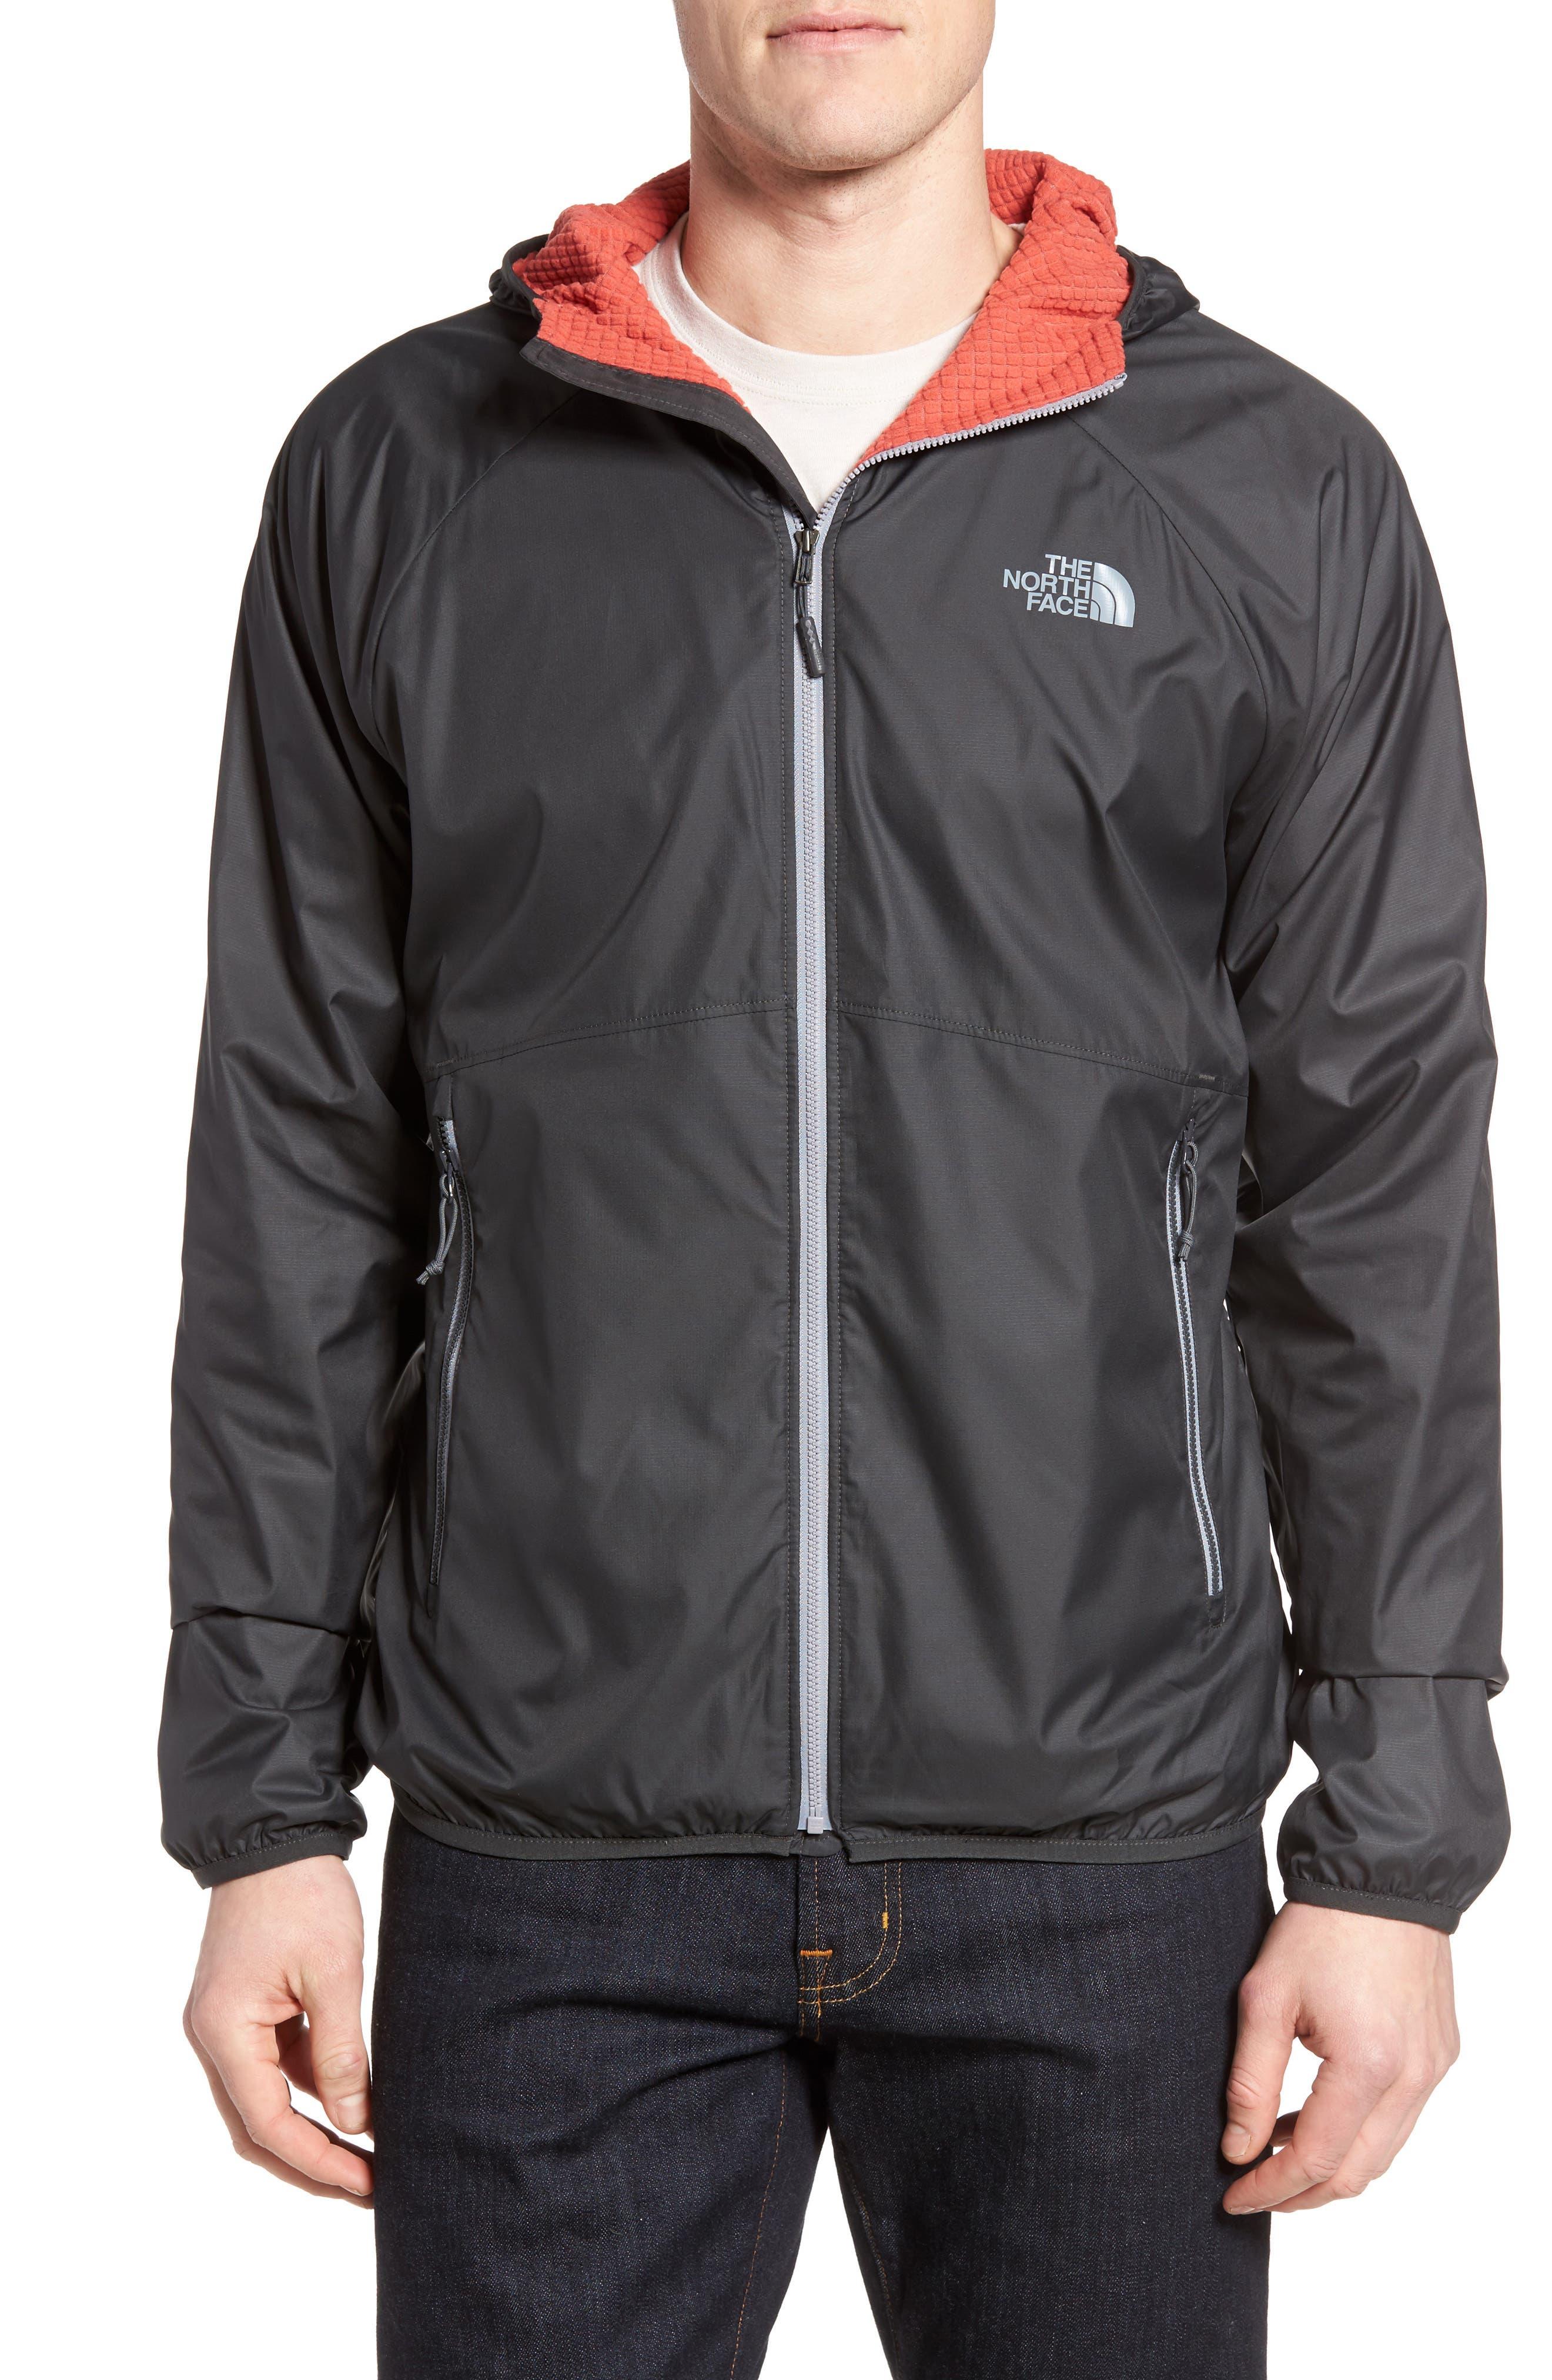 Desmond WindWall<sup>®</sup> Jacket,                         Main,                         color, 021